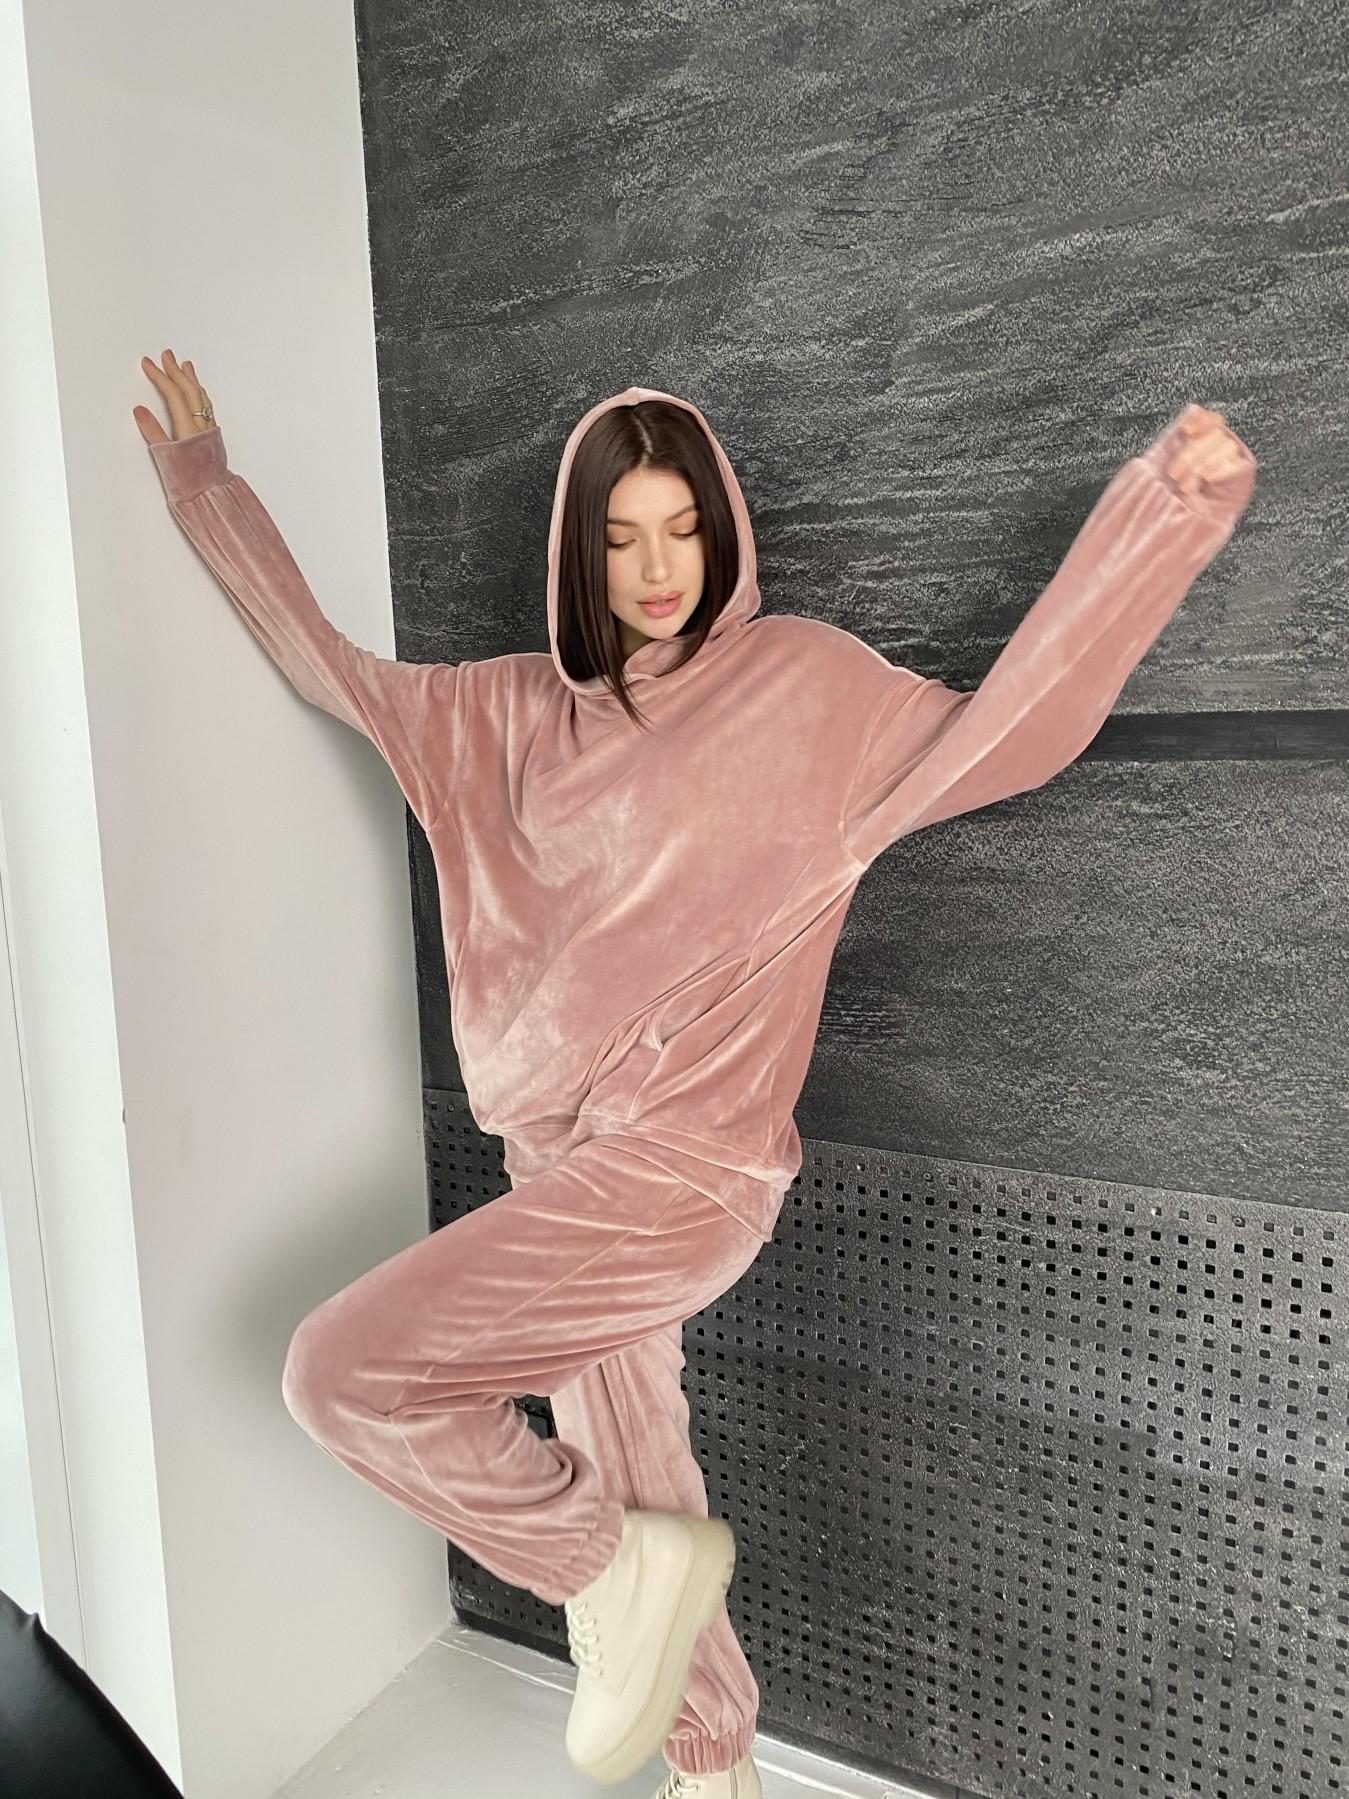 Марион Oversize  костюм из велюра 10690 АРТ. 47112 Цвет: Пудра - фото 2, интернет магазин tm-modus.ru